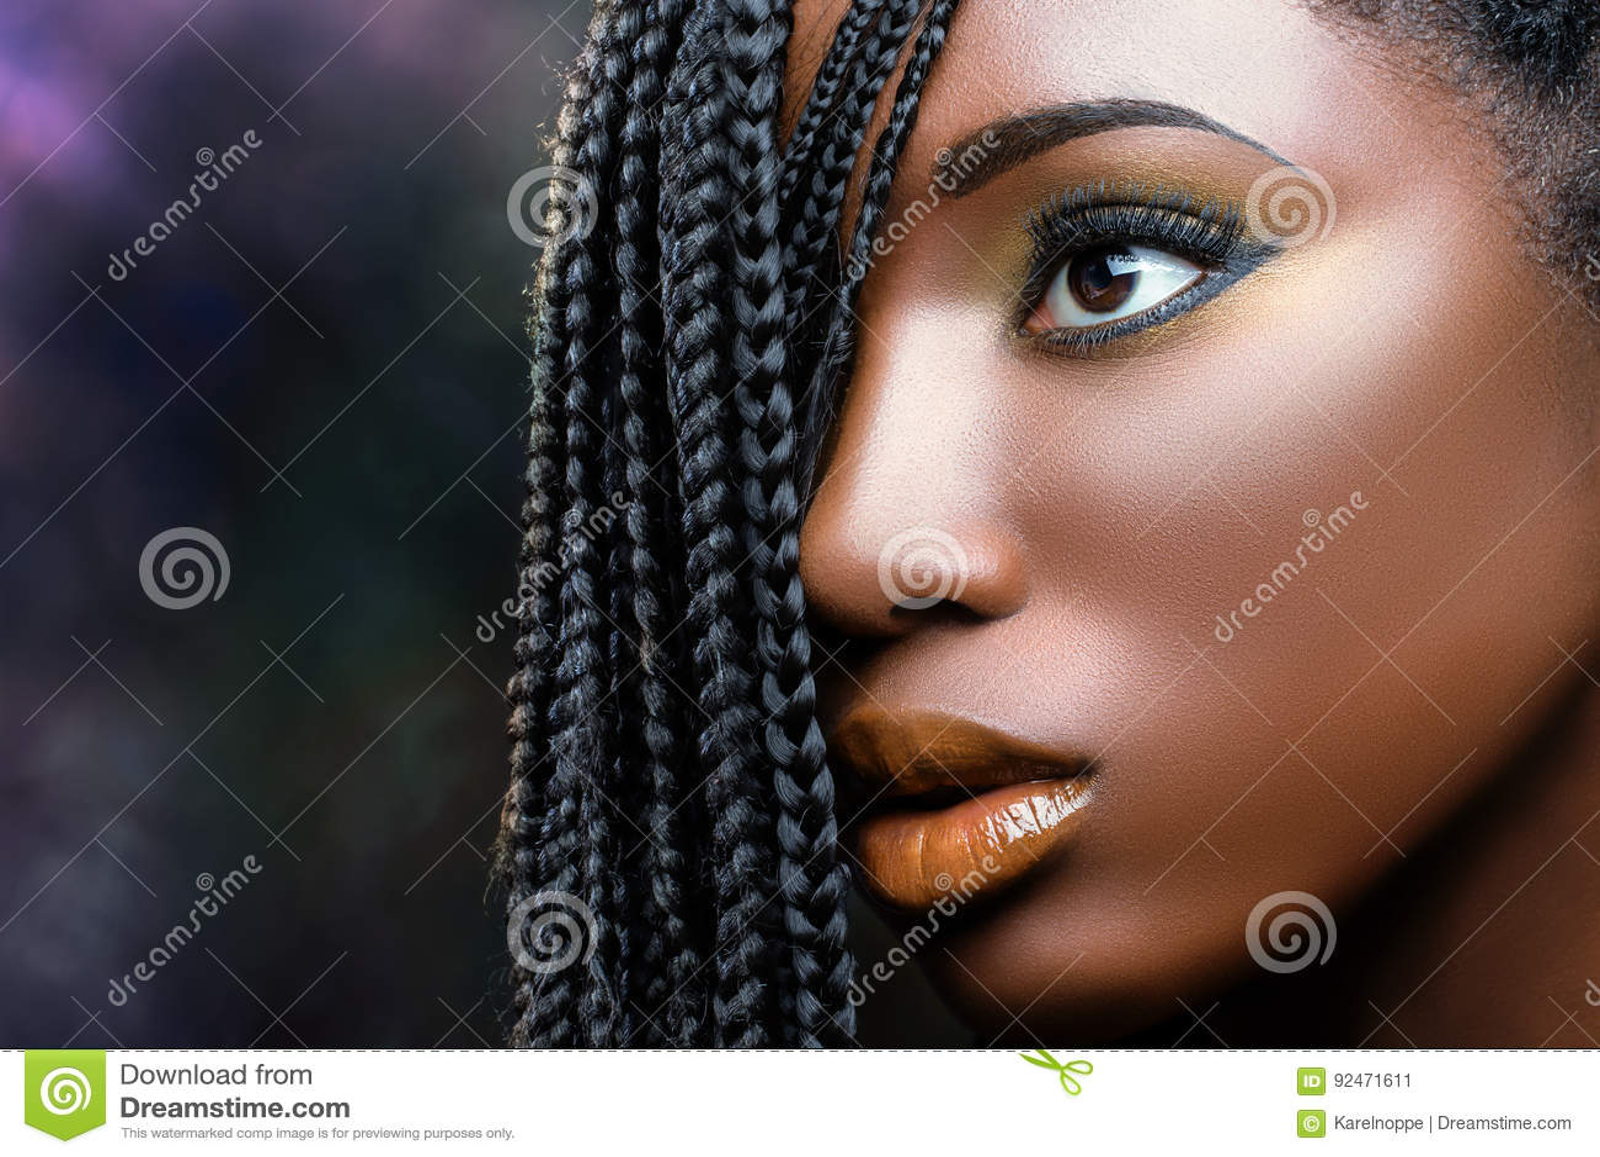 Ebony φωτογραφίες κάθεται στο πρόσωπό το καβλί φωτογραφίες μου